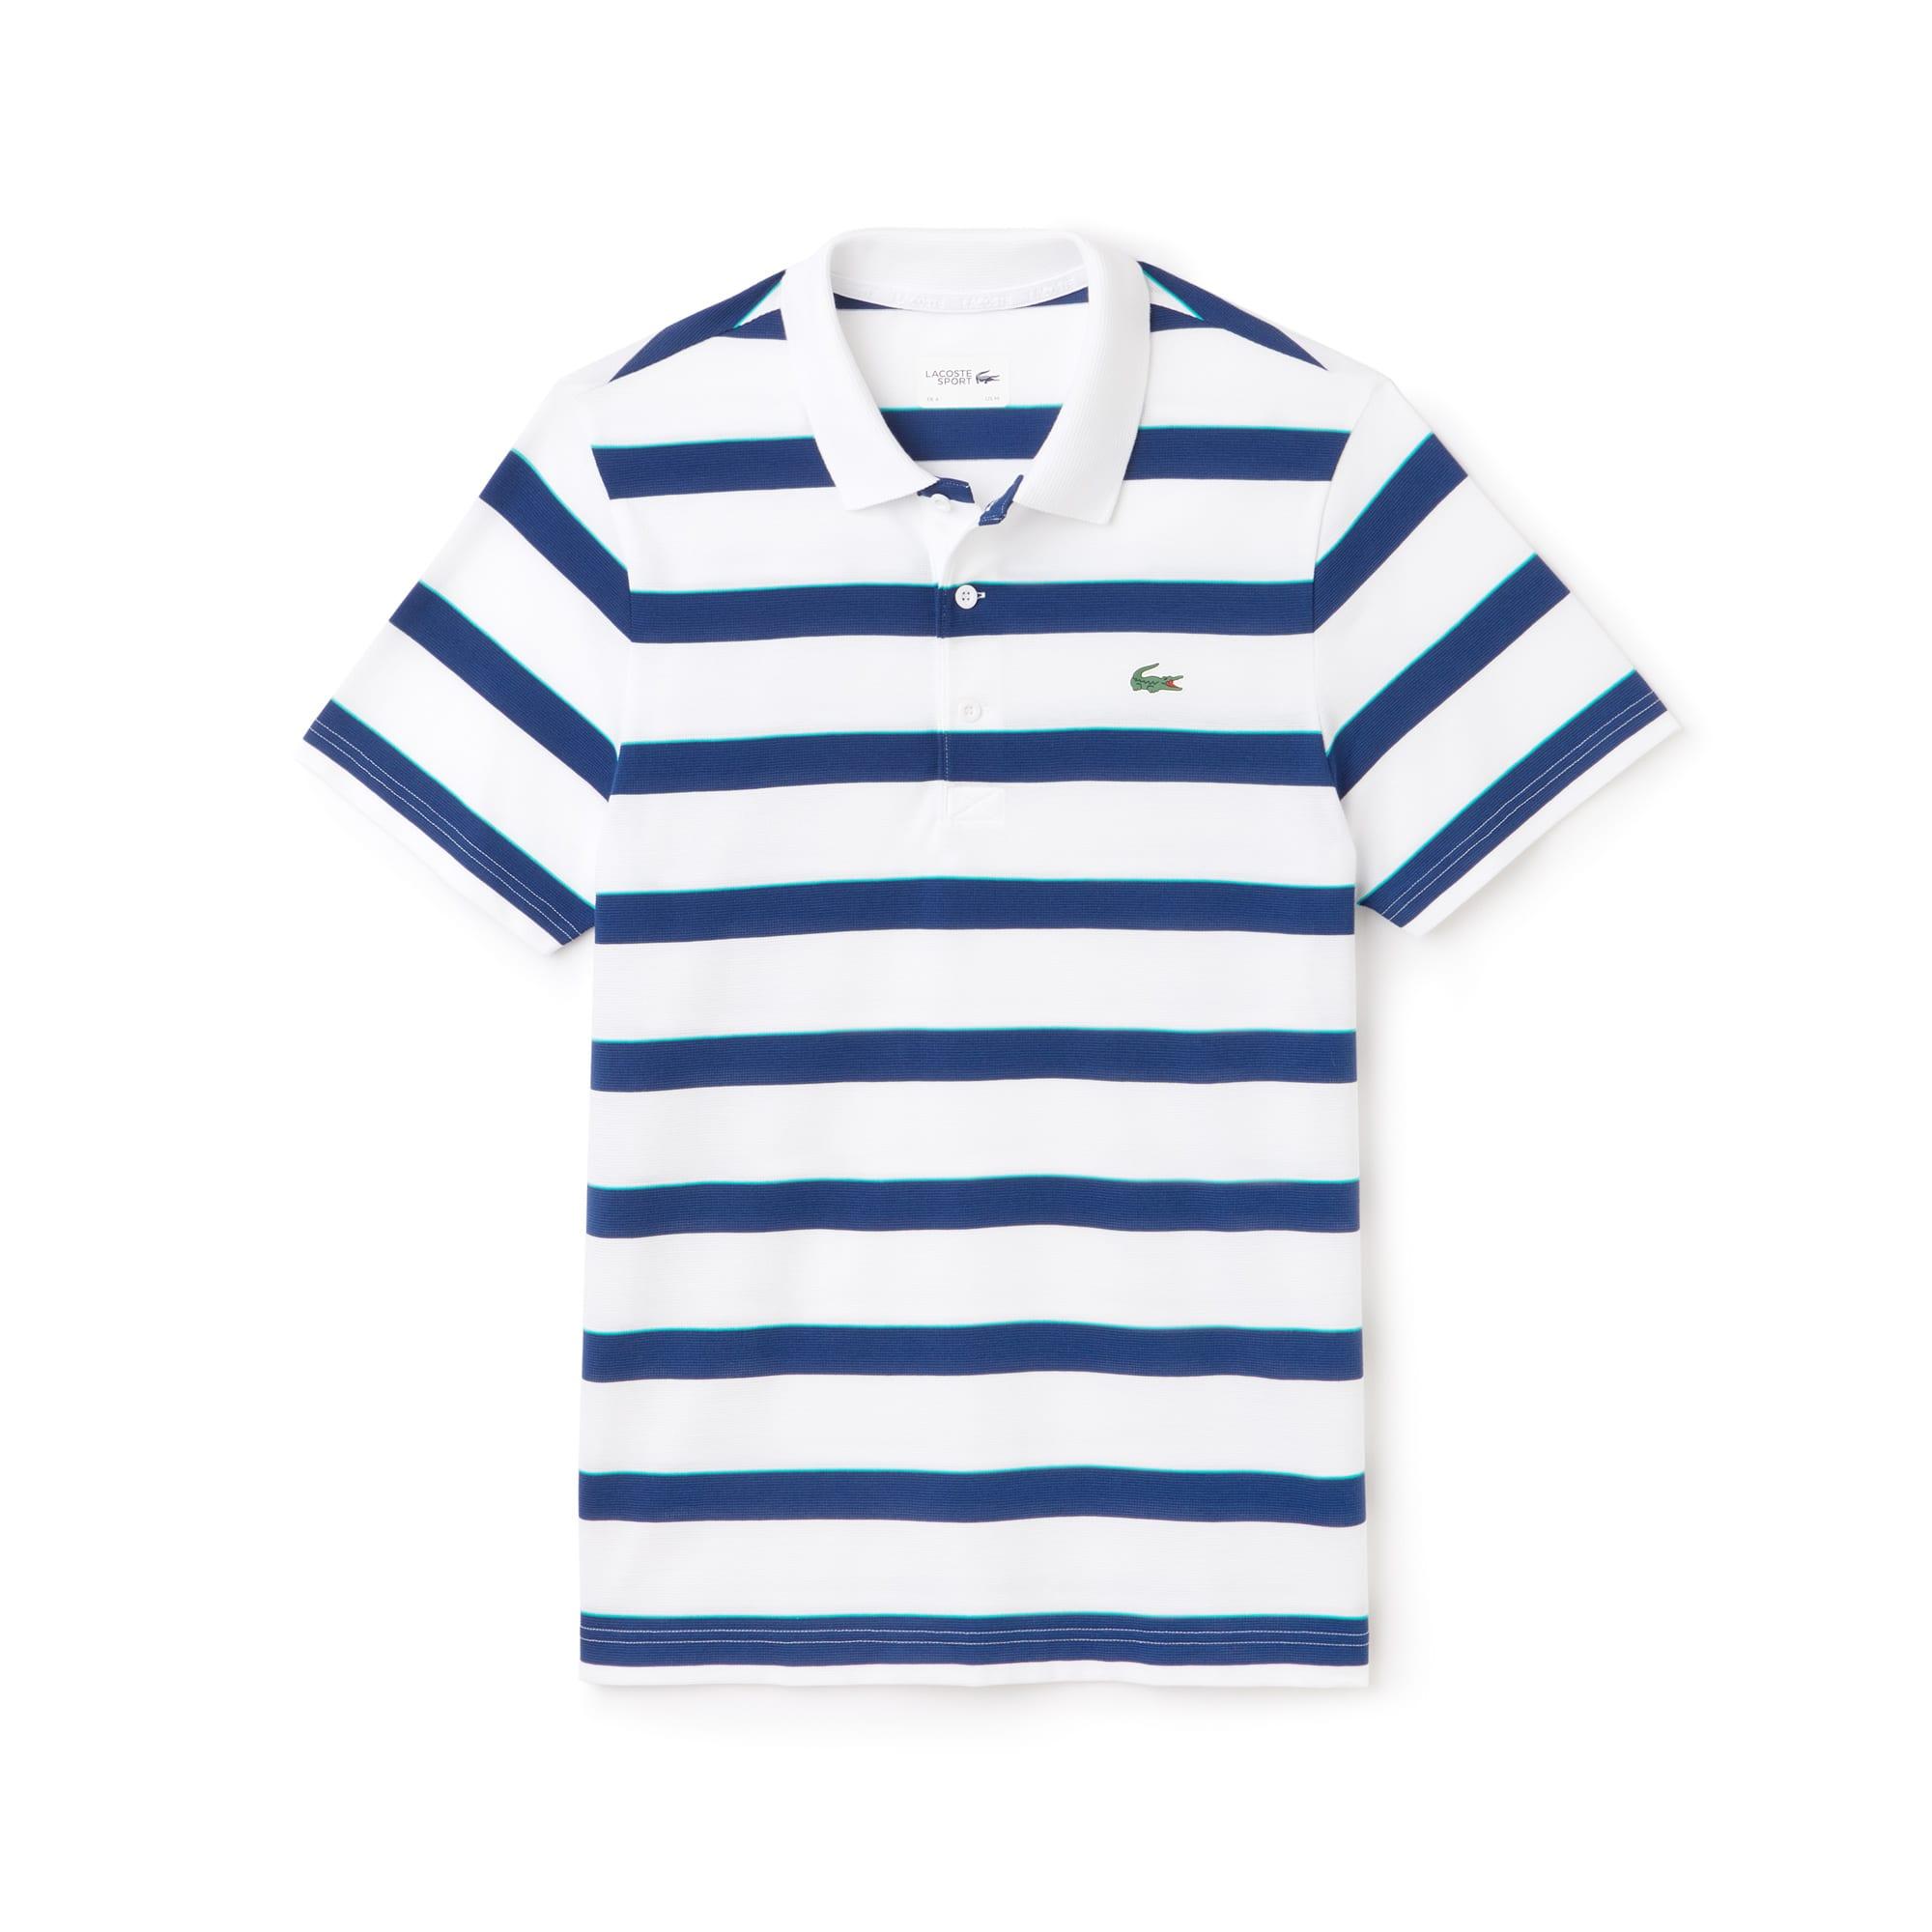 Men's Lacoste SPORT Striped Ultra-Light Cotton Tennis Polo